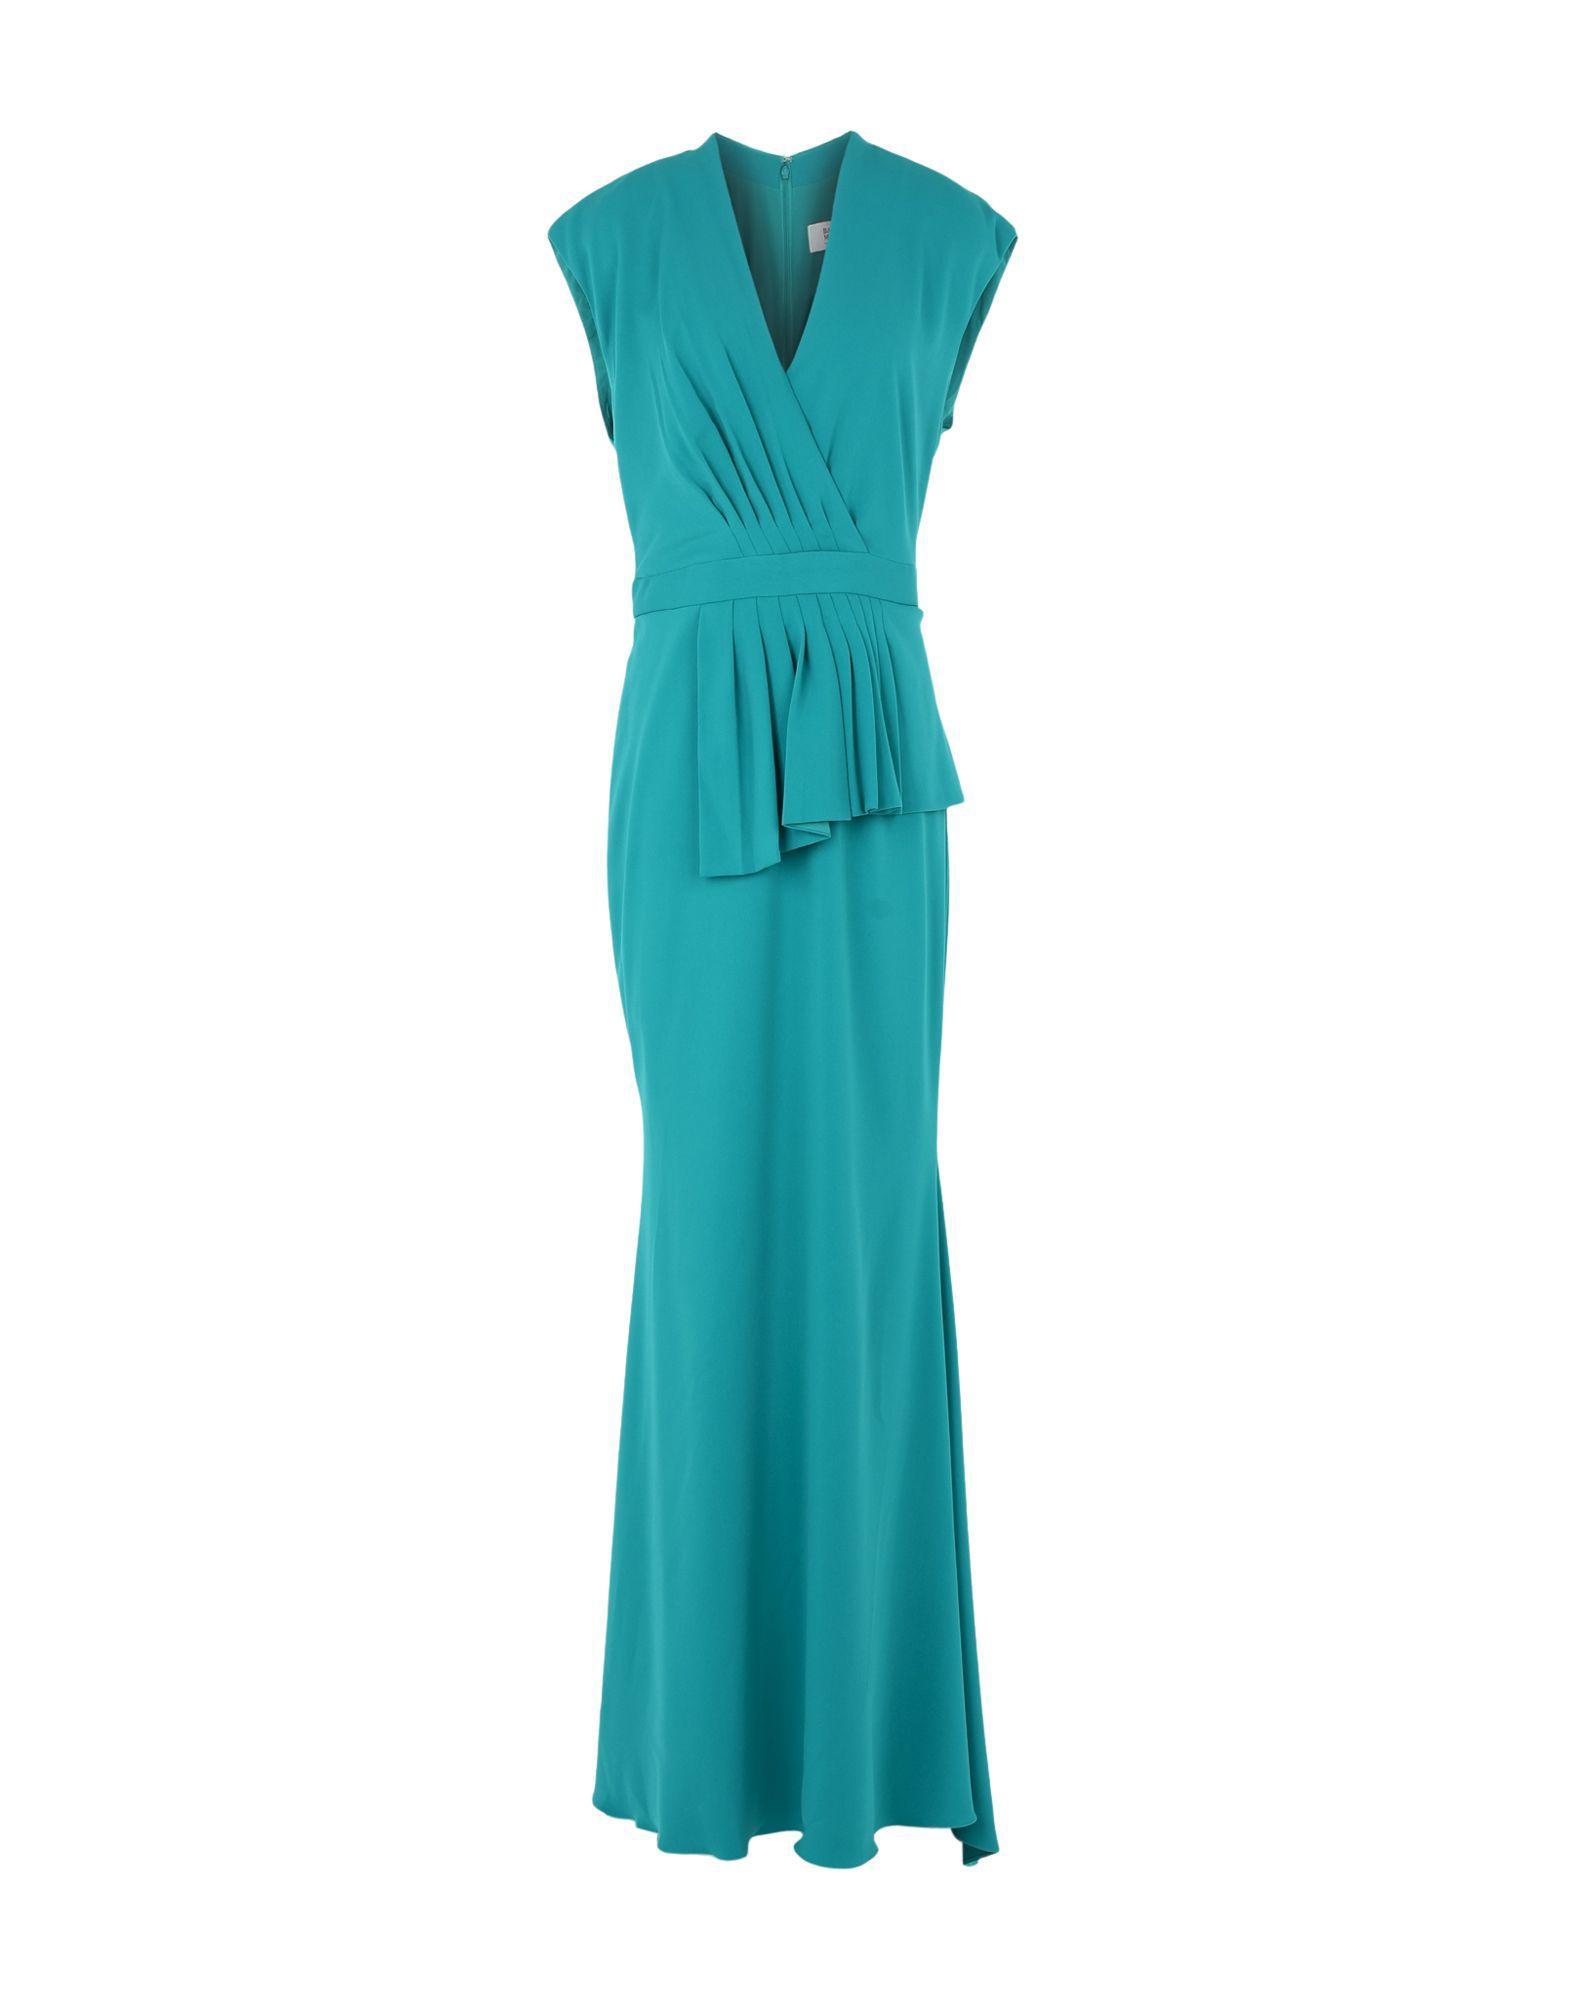 Badgley Mischka Long Dresses In Green